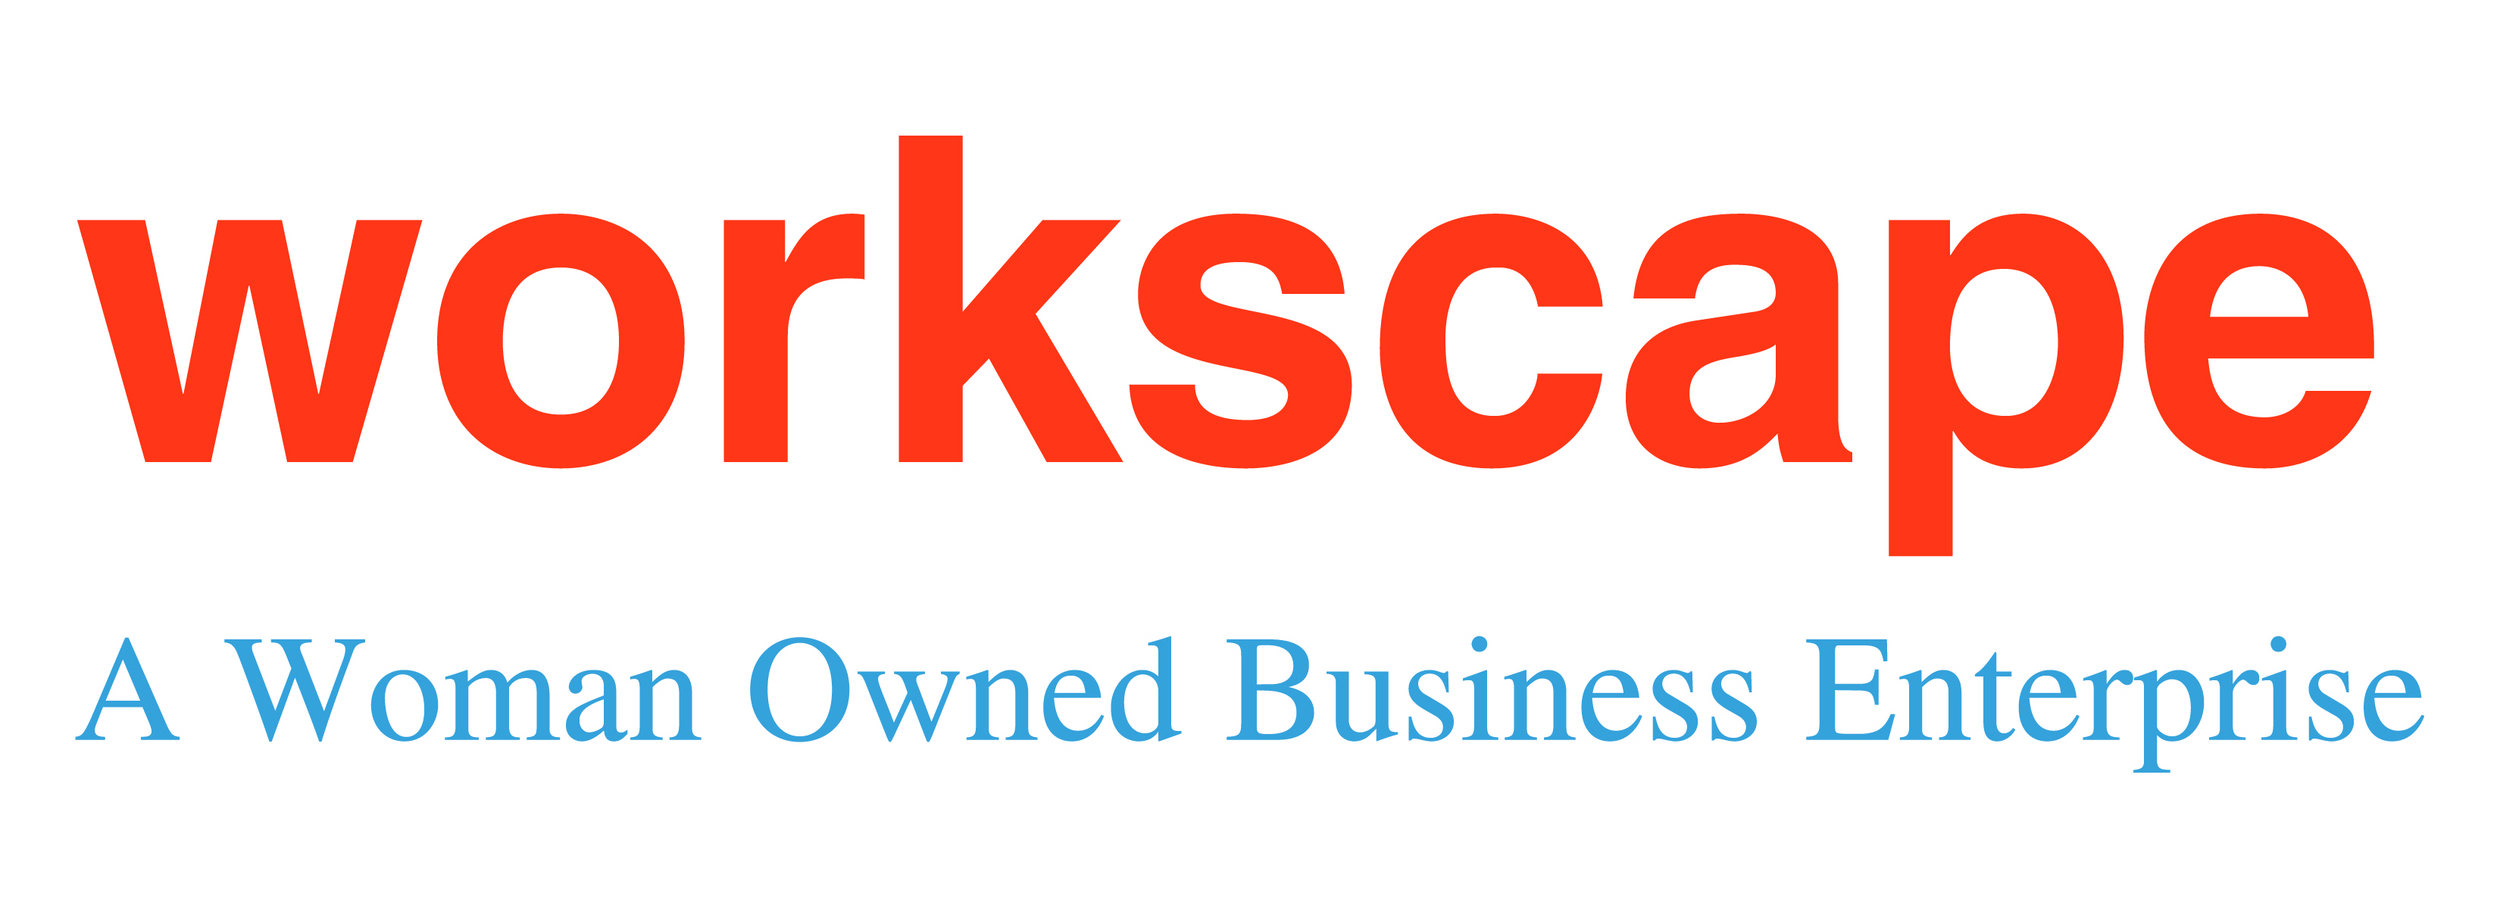 Workscape, Inc.  Mid-Level Interior Designer  Pittsburgh, PA  Dave Sauter  dsauter@workscapeinc.com   412-920-6300   https://workscapeinc.com/